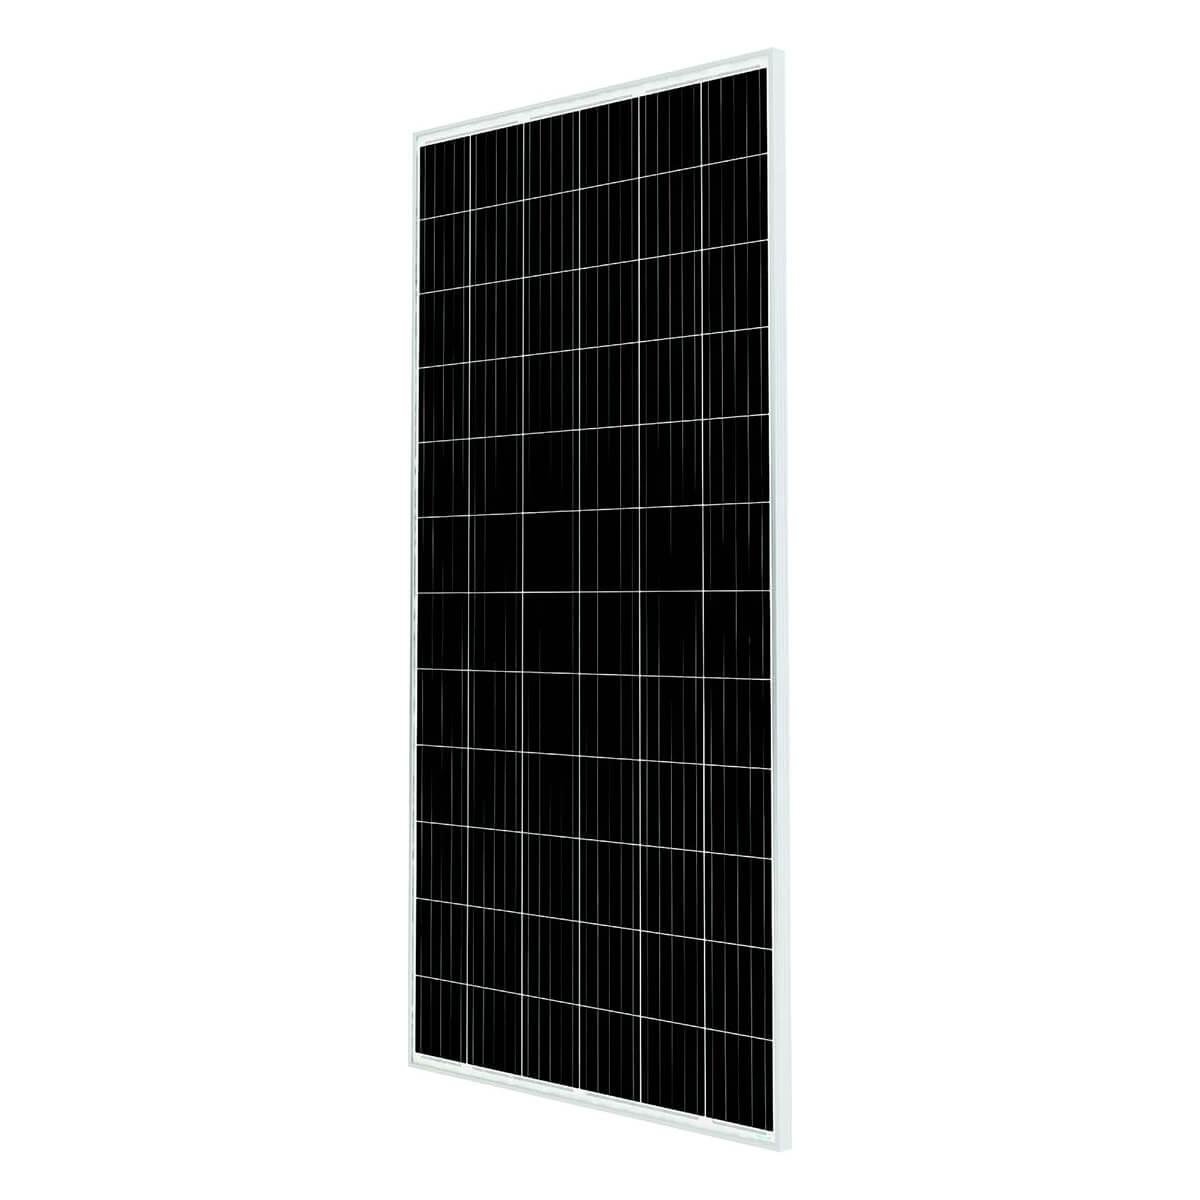 cw enerji 395W panel, cw enerji 395Watt panel, cw enerji 395 W panel, cw enerji 395 Watt panel, cw enerji 395 Watt monokristal panel, cw enerji 395 W watt gunes paneli, cw enerji 395 W watt monokristal gunes paneli, cw enerji 395 W Watt fotovoltaik monokristal solar panel, cw enerji 395W monokristal gunes enerjisi, cw enerji CWT395-72PM-395 panel, CW Enerji 395 WATT